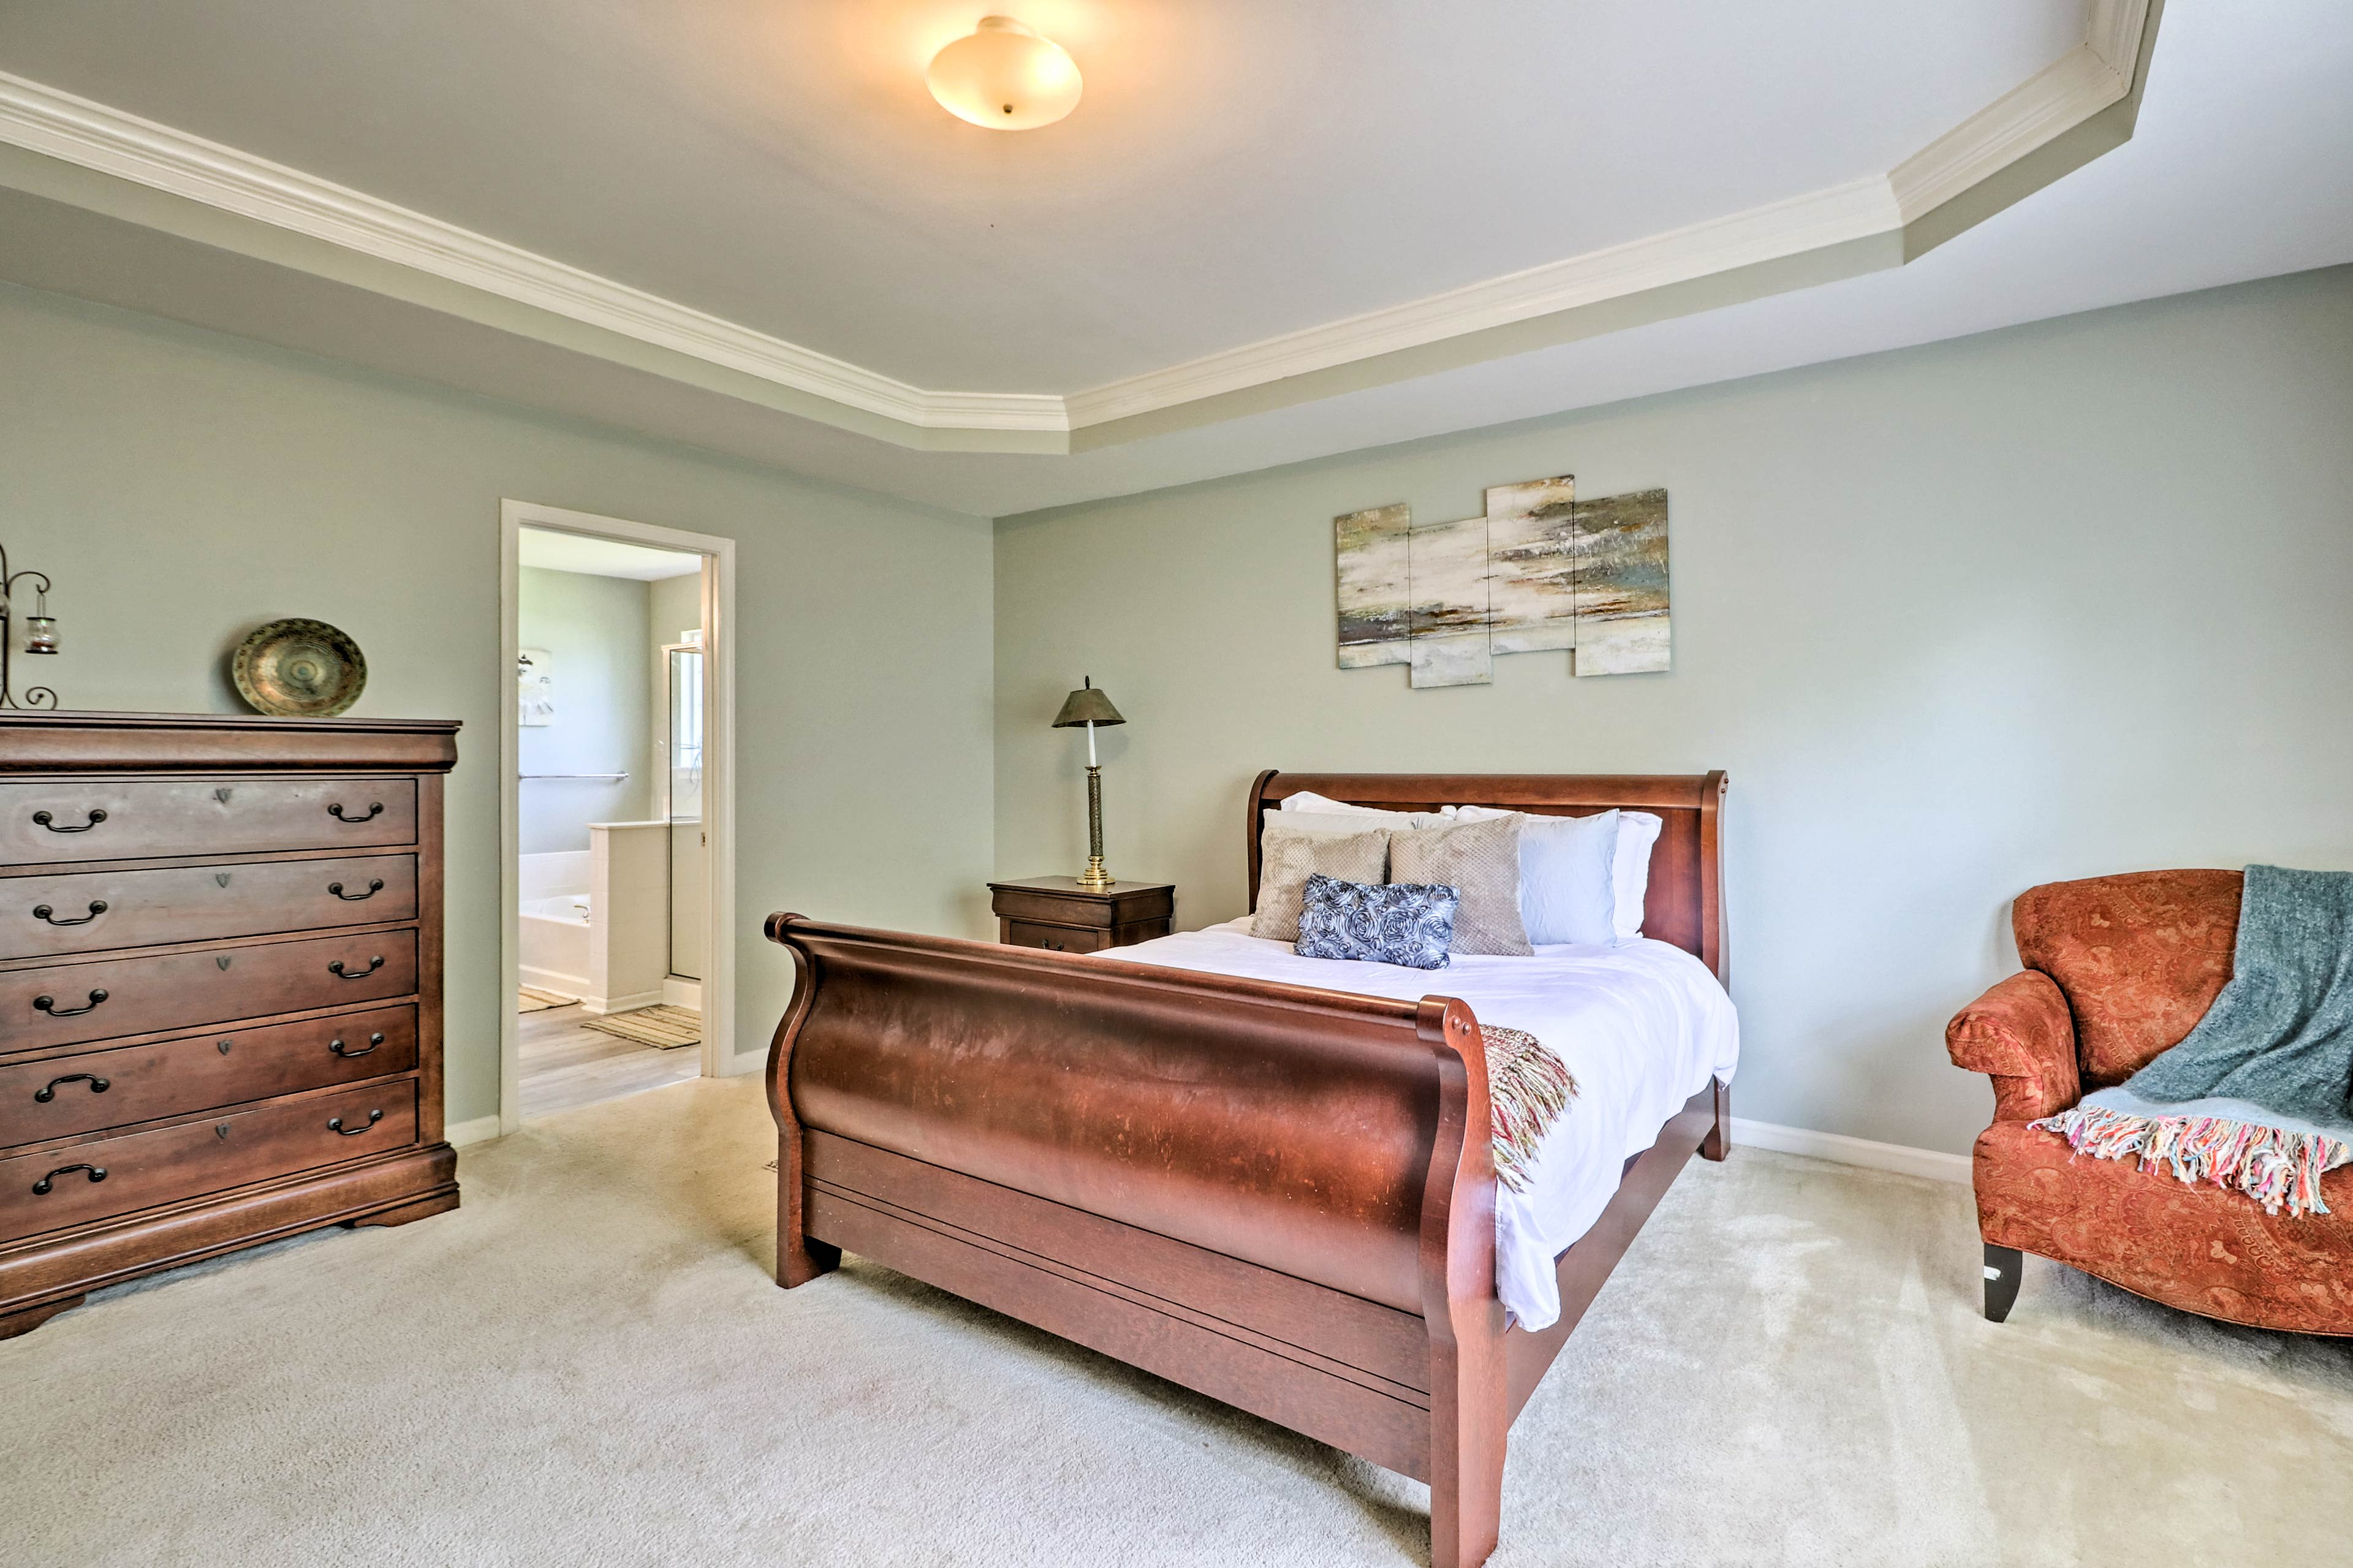 Sleep peacefully in the master bedroom.